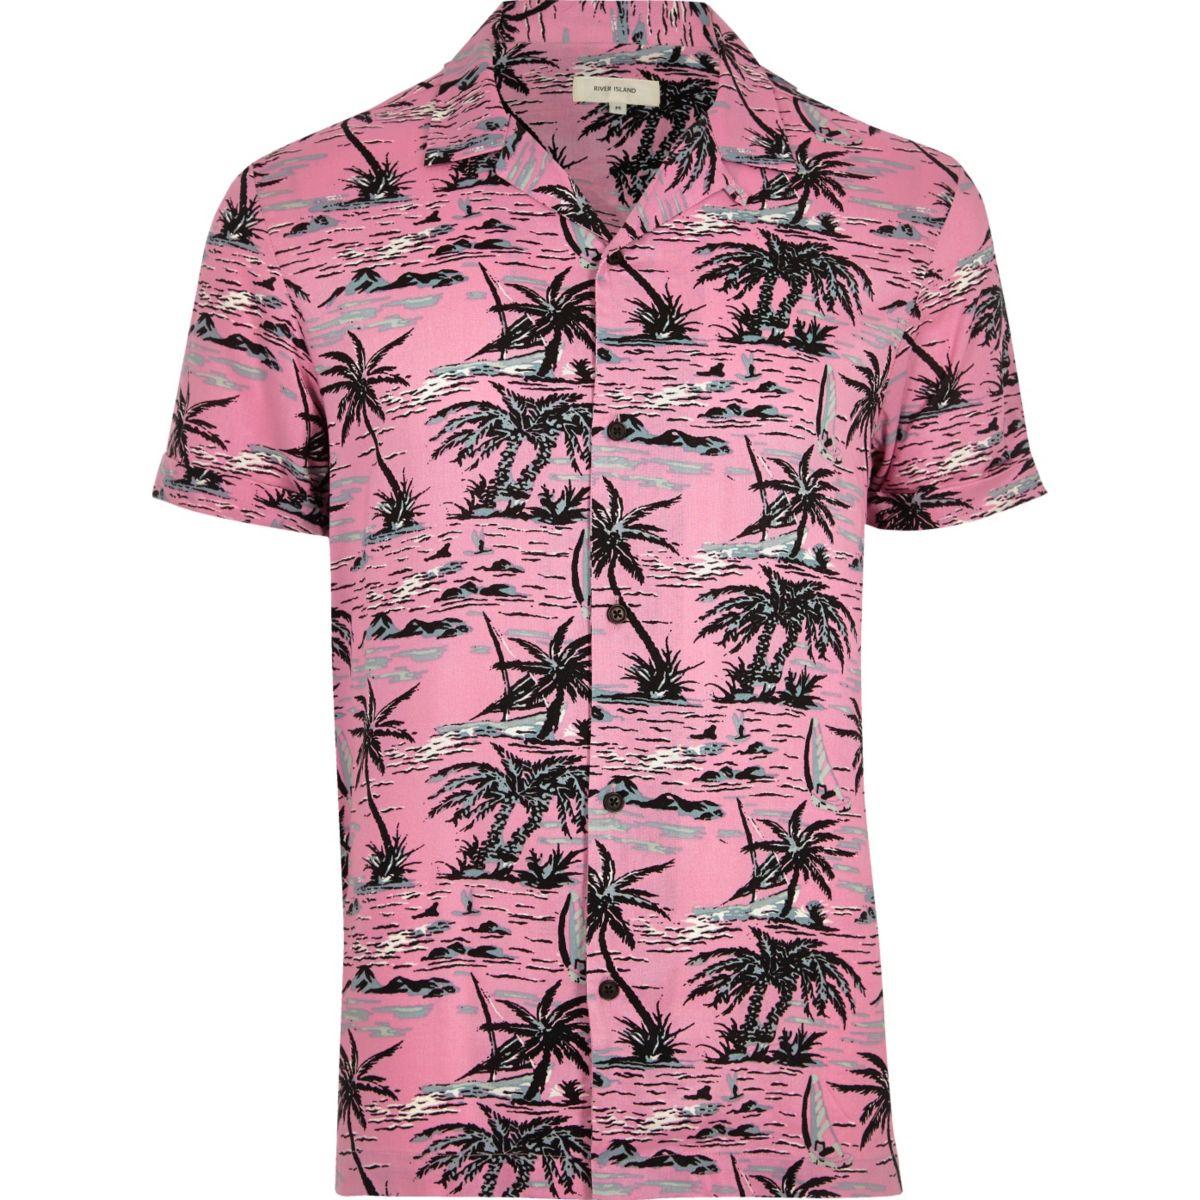 Pink tropical print short sleeve shirt